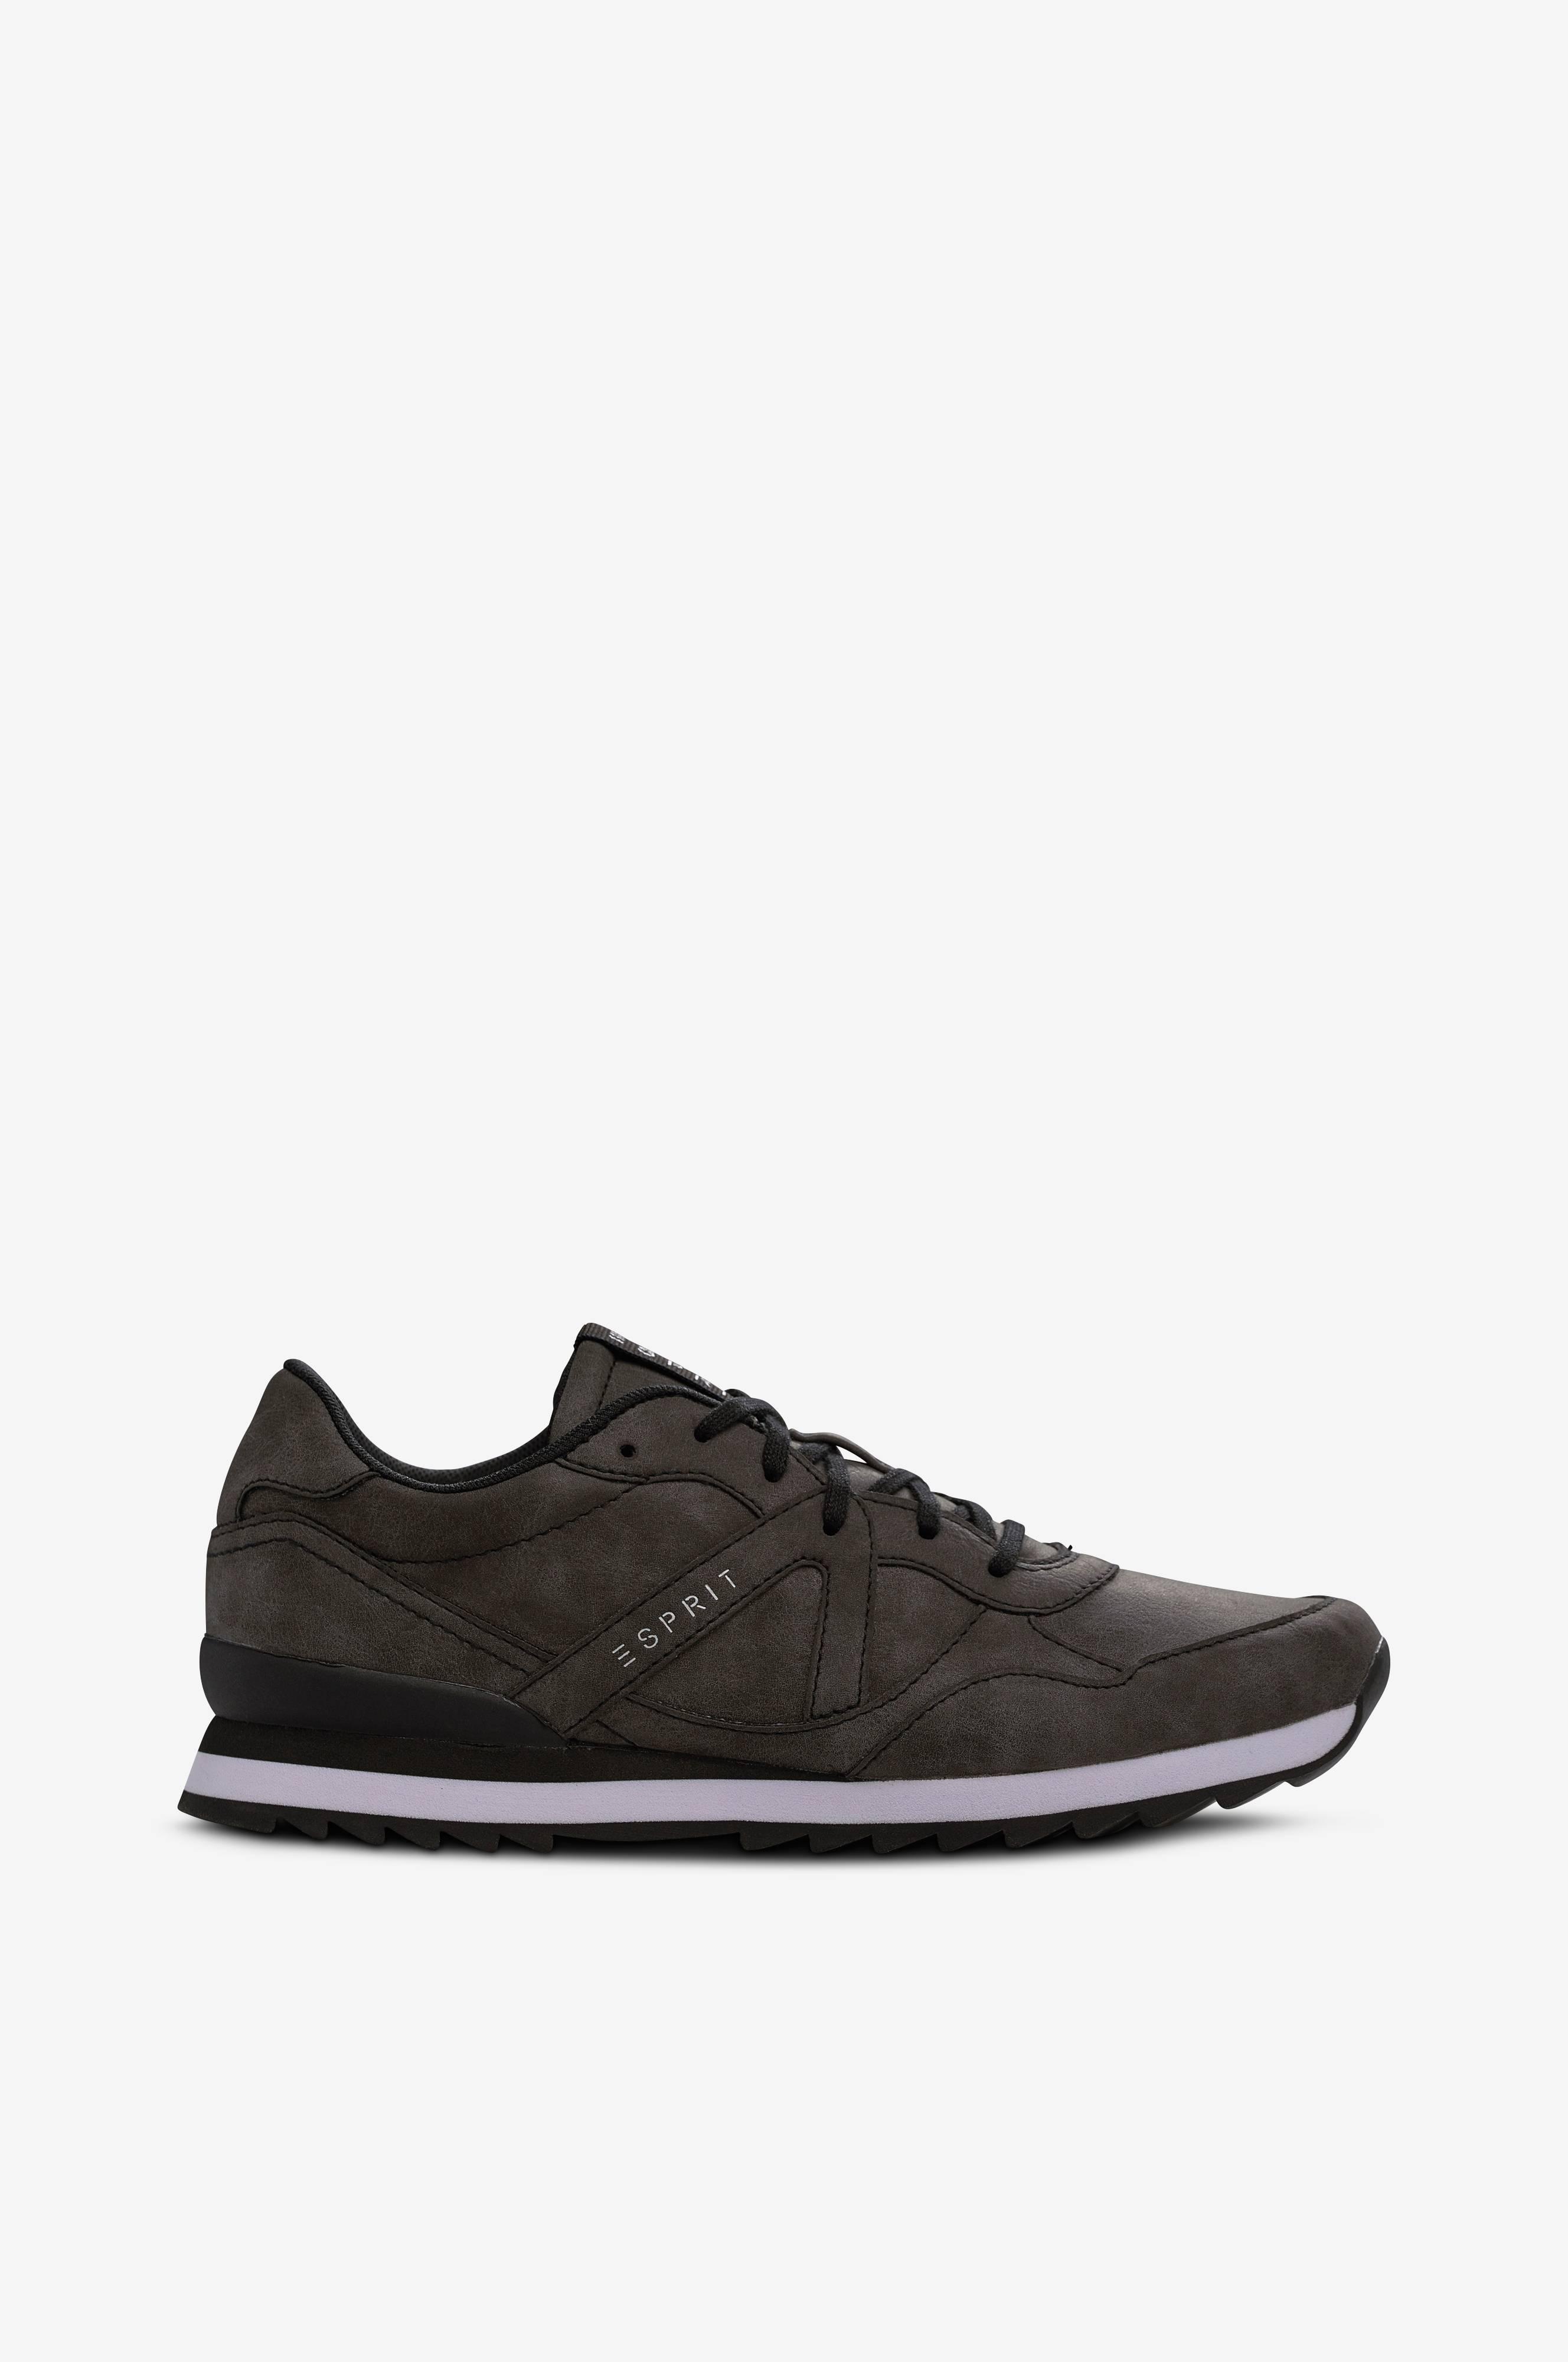 Esprit Sneakers Astro Lu Sort Dame Ellos.dk